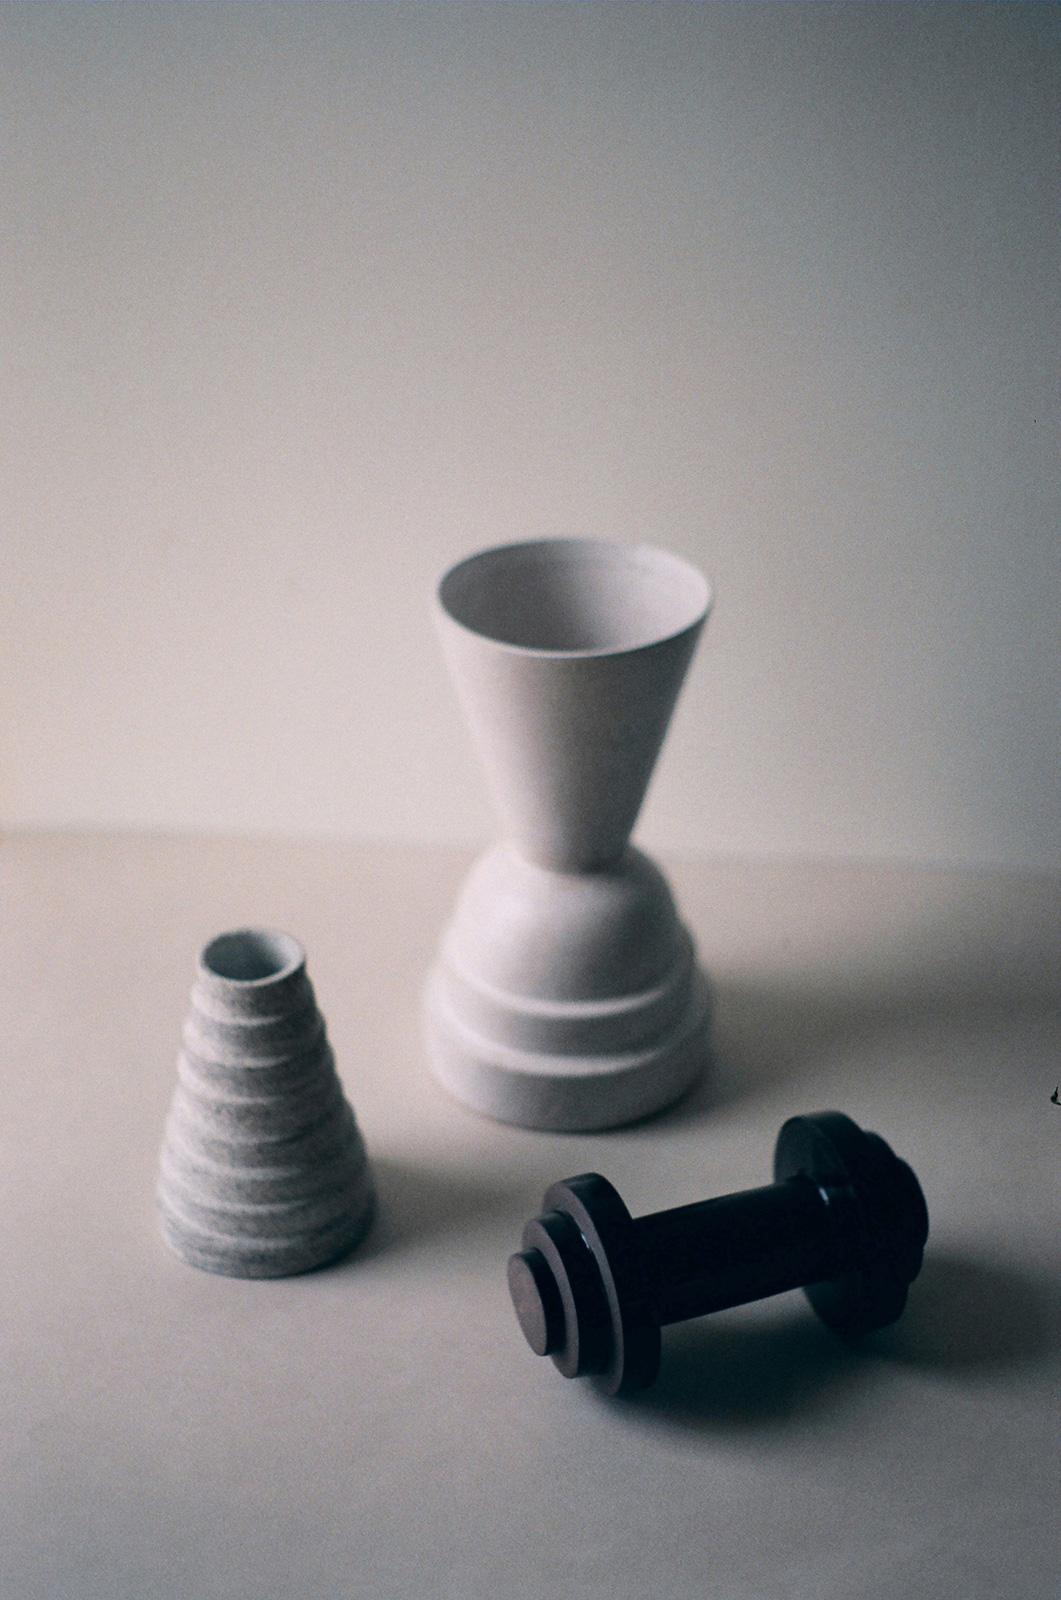 Design-Natalie-Weinberger-Ceramics-8